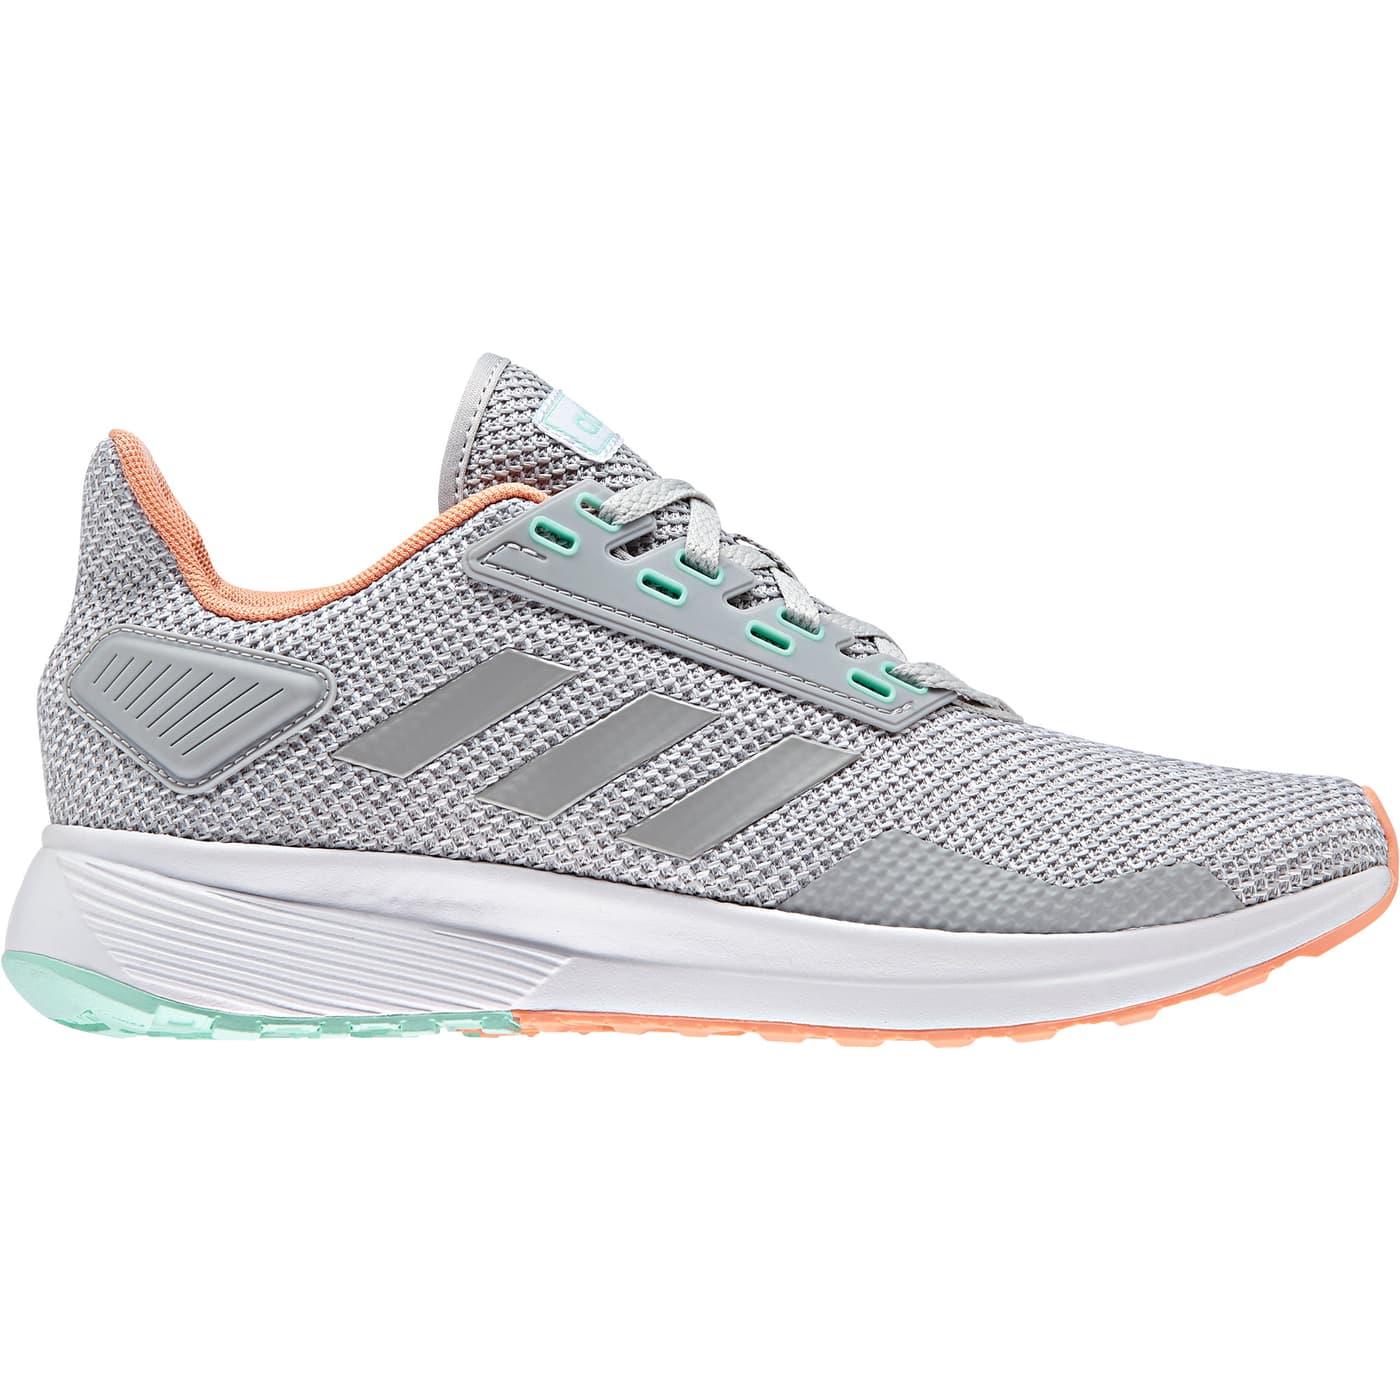 online store 48c5a ccc23 9 Running Da Adidas Donna Scarpa Duramo Migros 1TqBwBPx